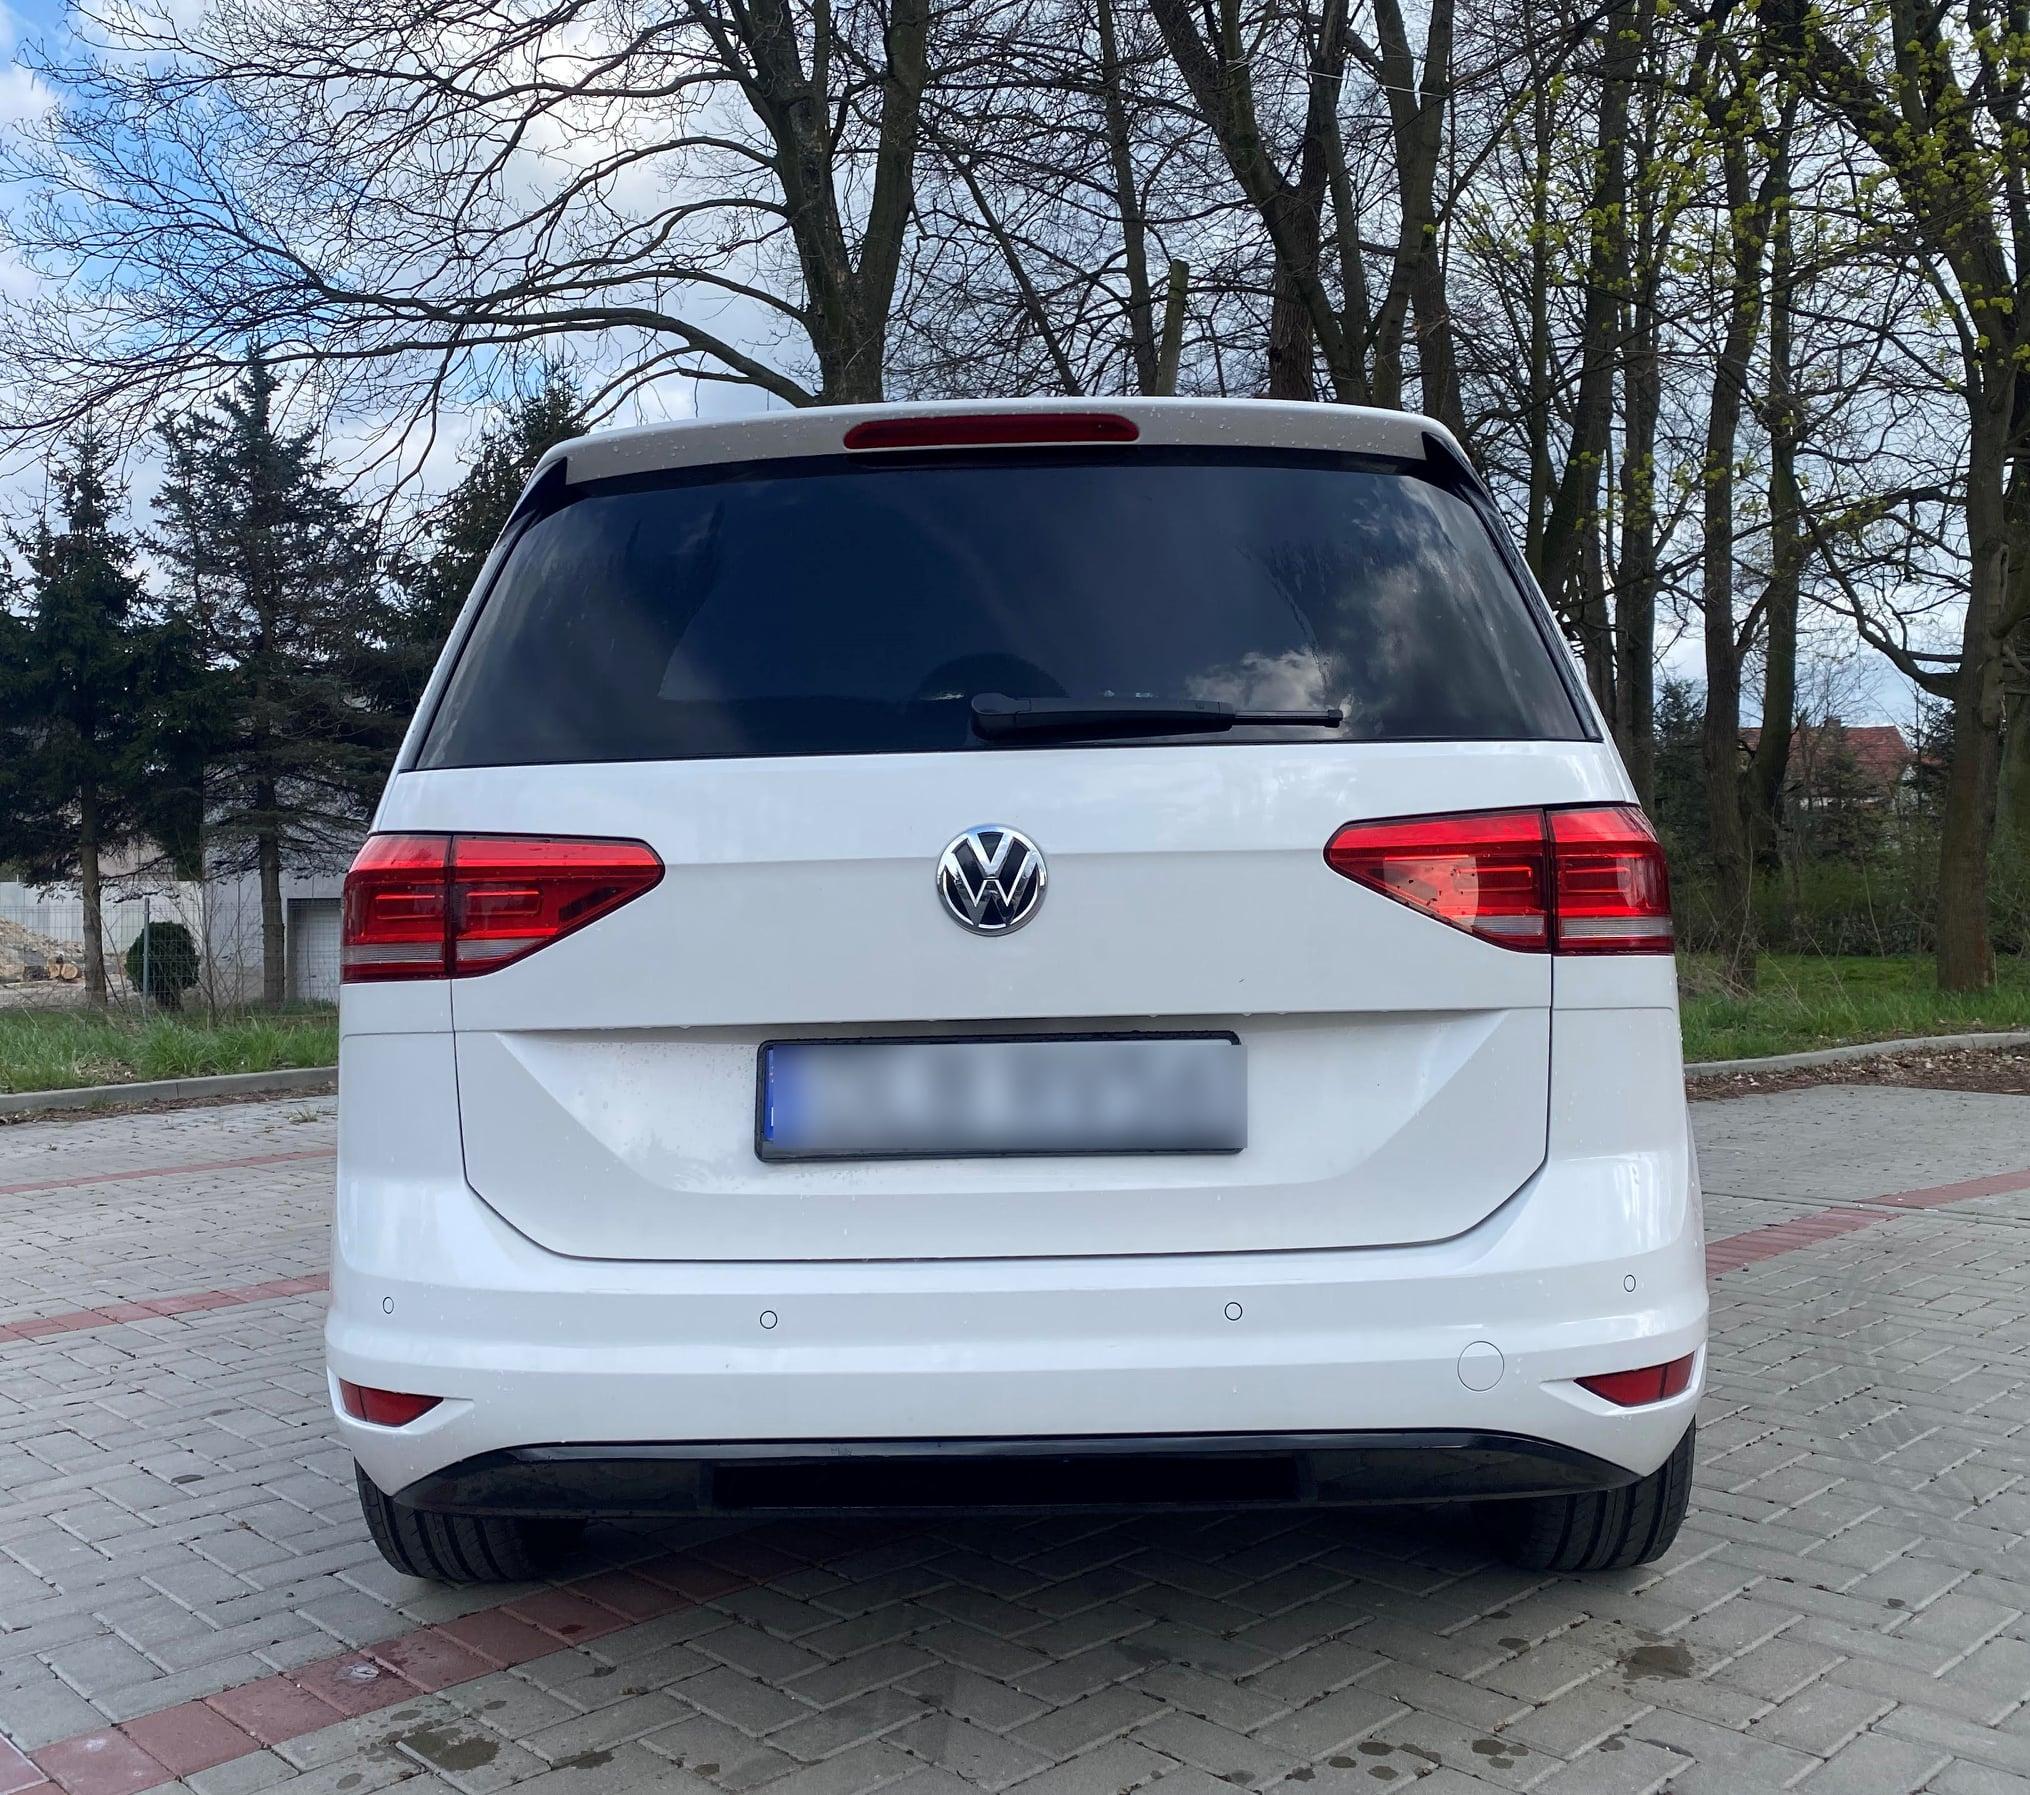 VW Touran 2.0TDI 110KM >> 167KM 407Nm